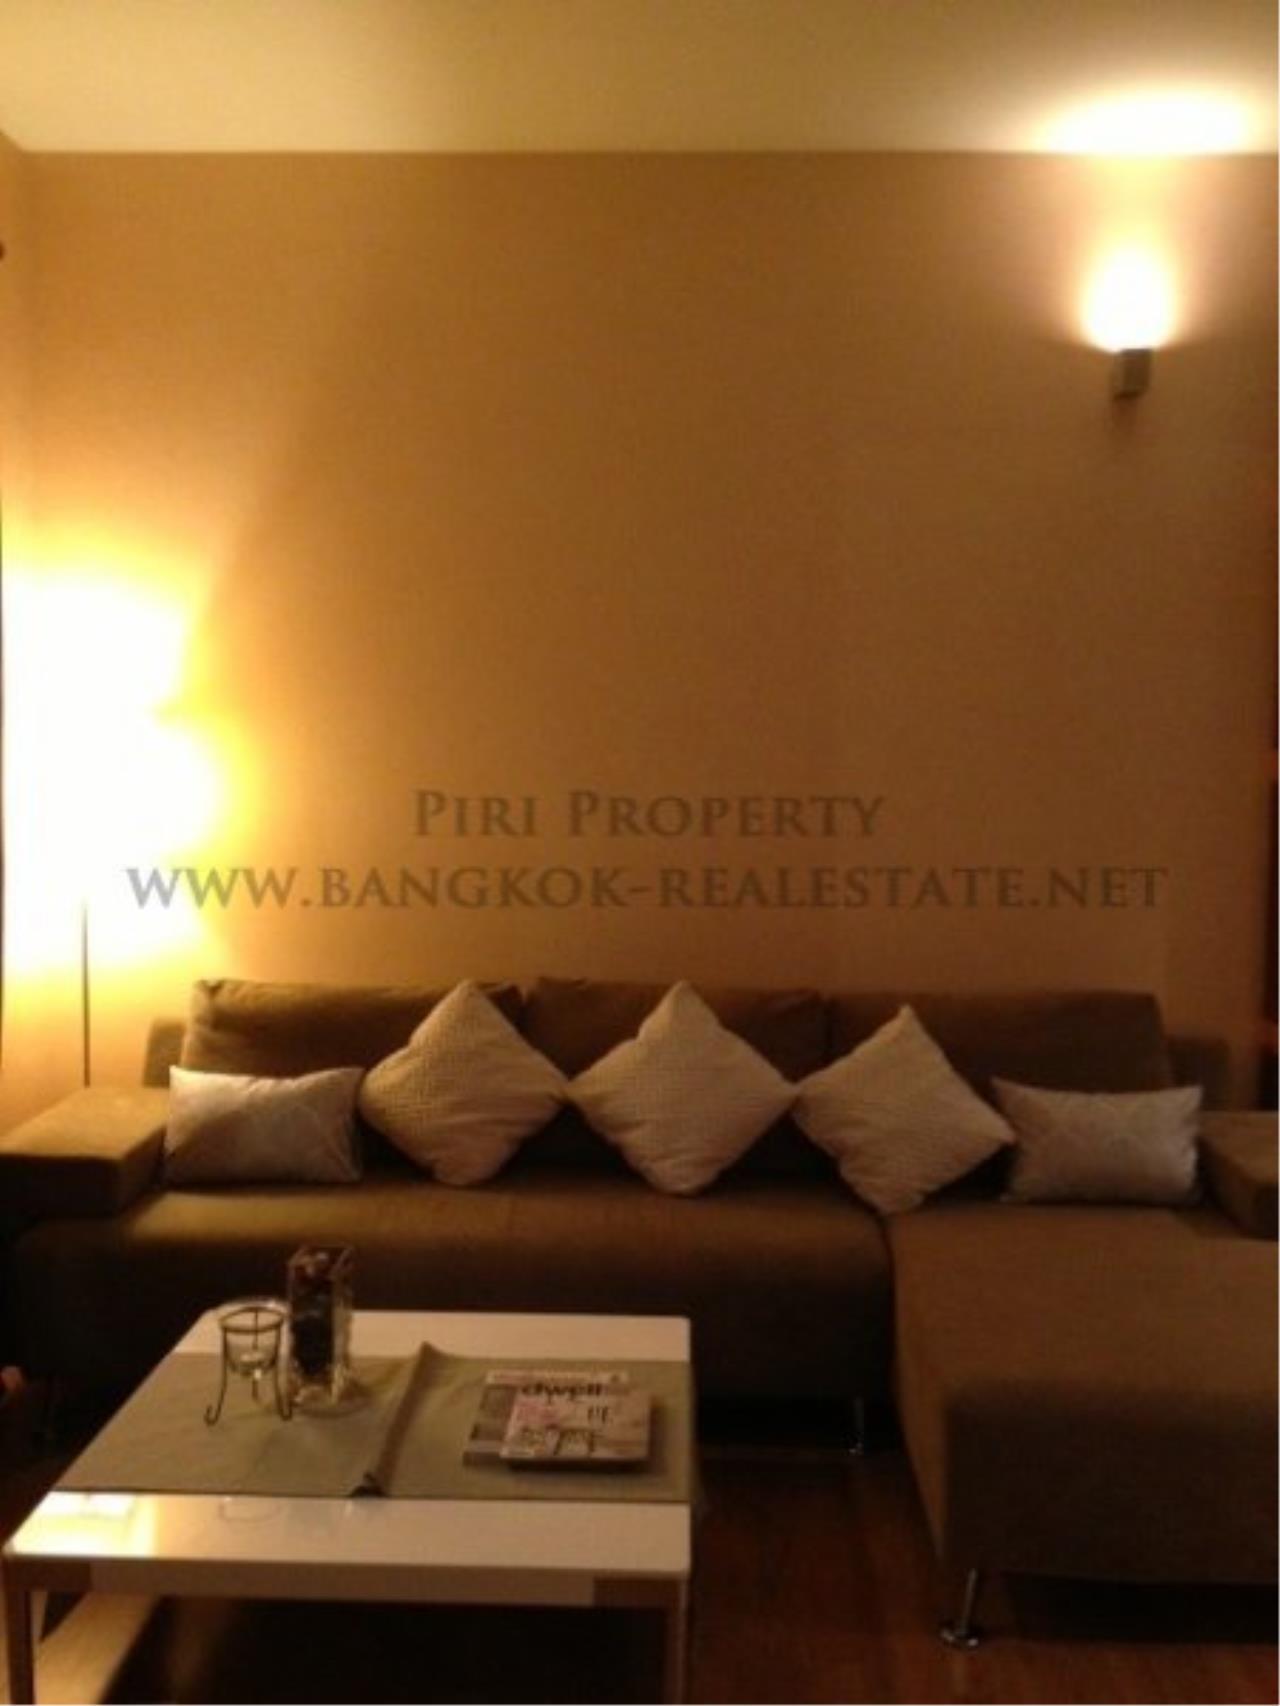 Piri Property Agency's Nice 1 Bedroom Condo near Ratchtewi BTS Station - 58 SQM - 30K 4